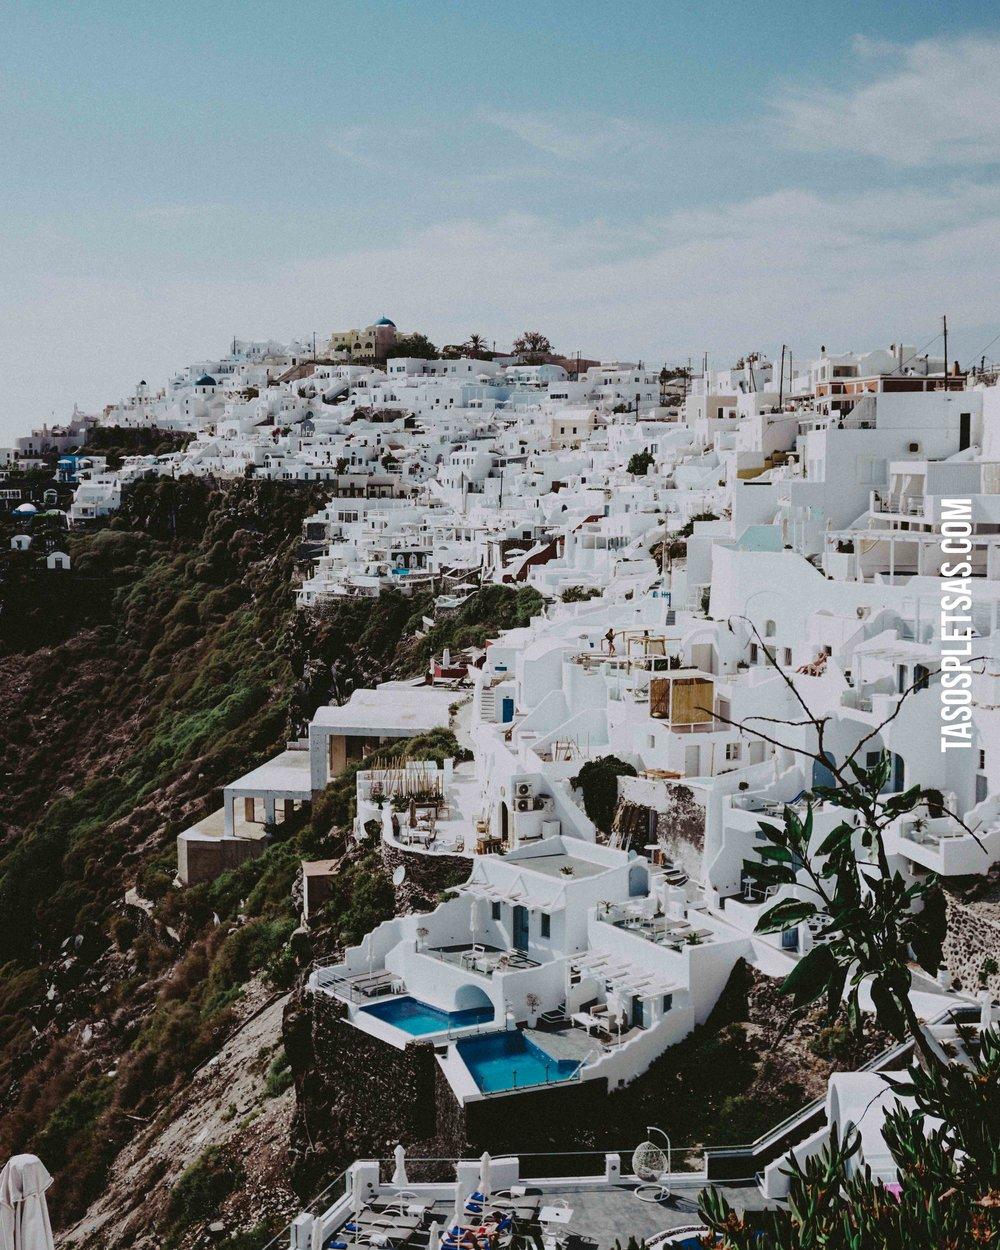 Santorini WEB-Santorini Part 2-Lifestyle Presets-7-Before.jpg